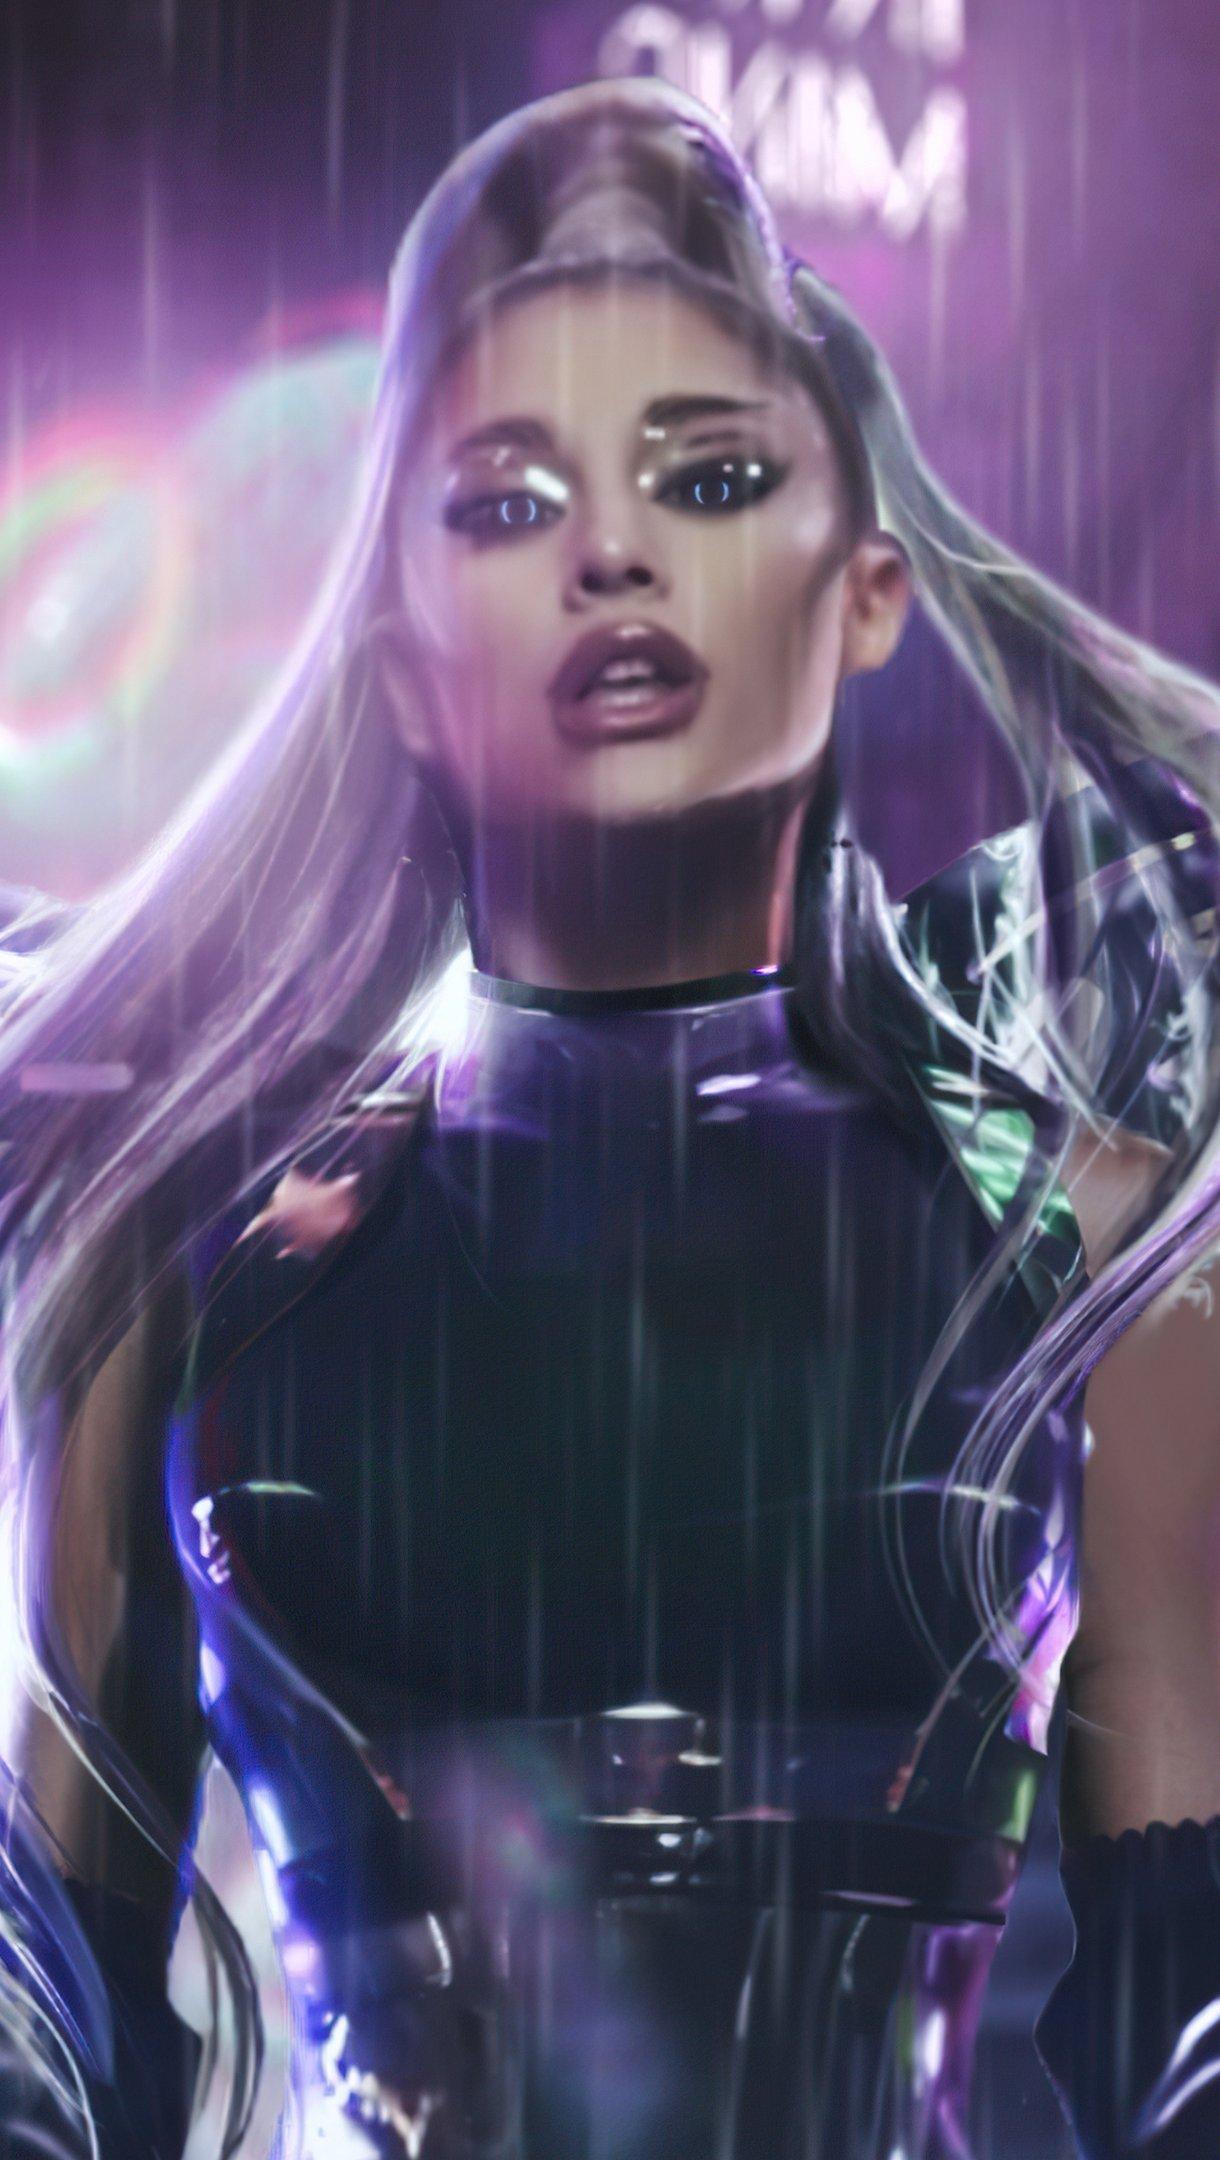 Wallpaper Ariana Grande Rain on me Vertical